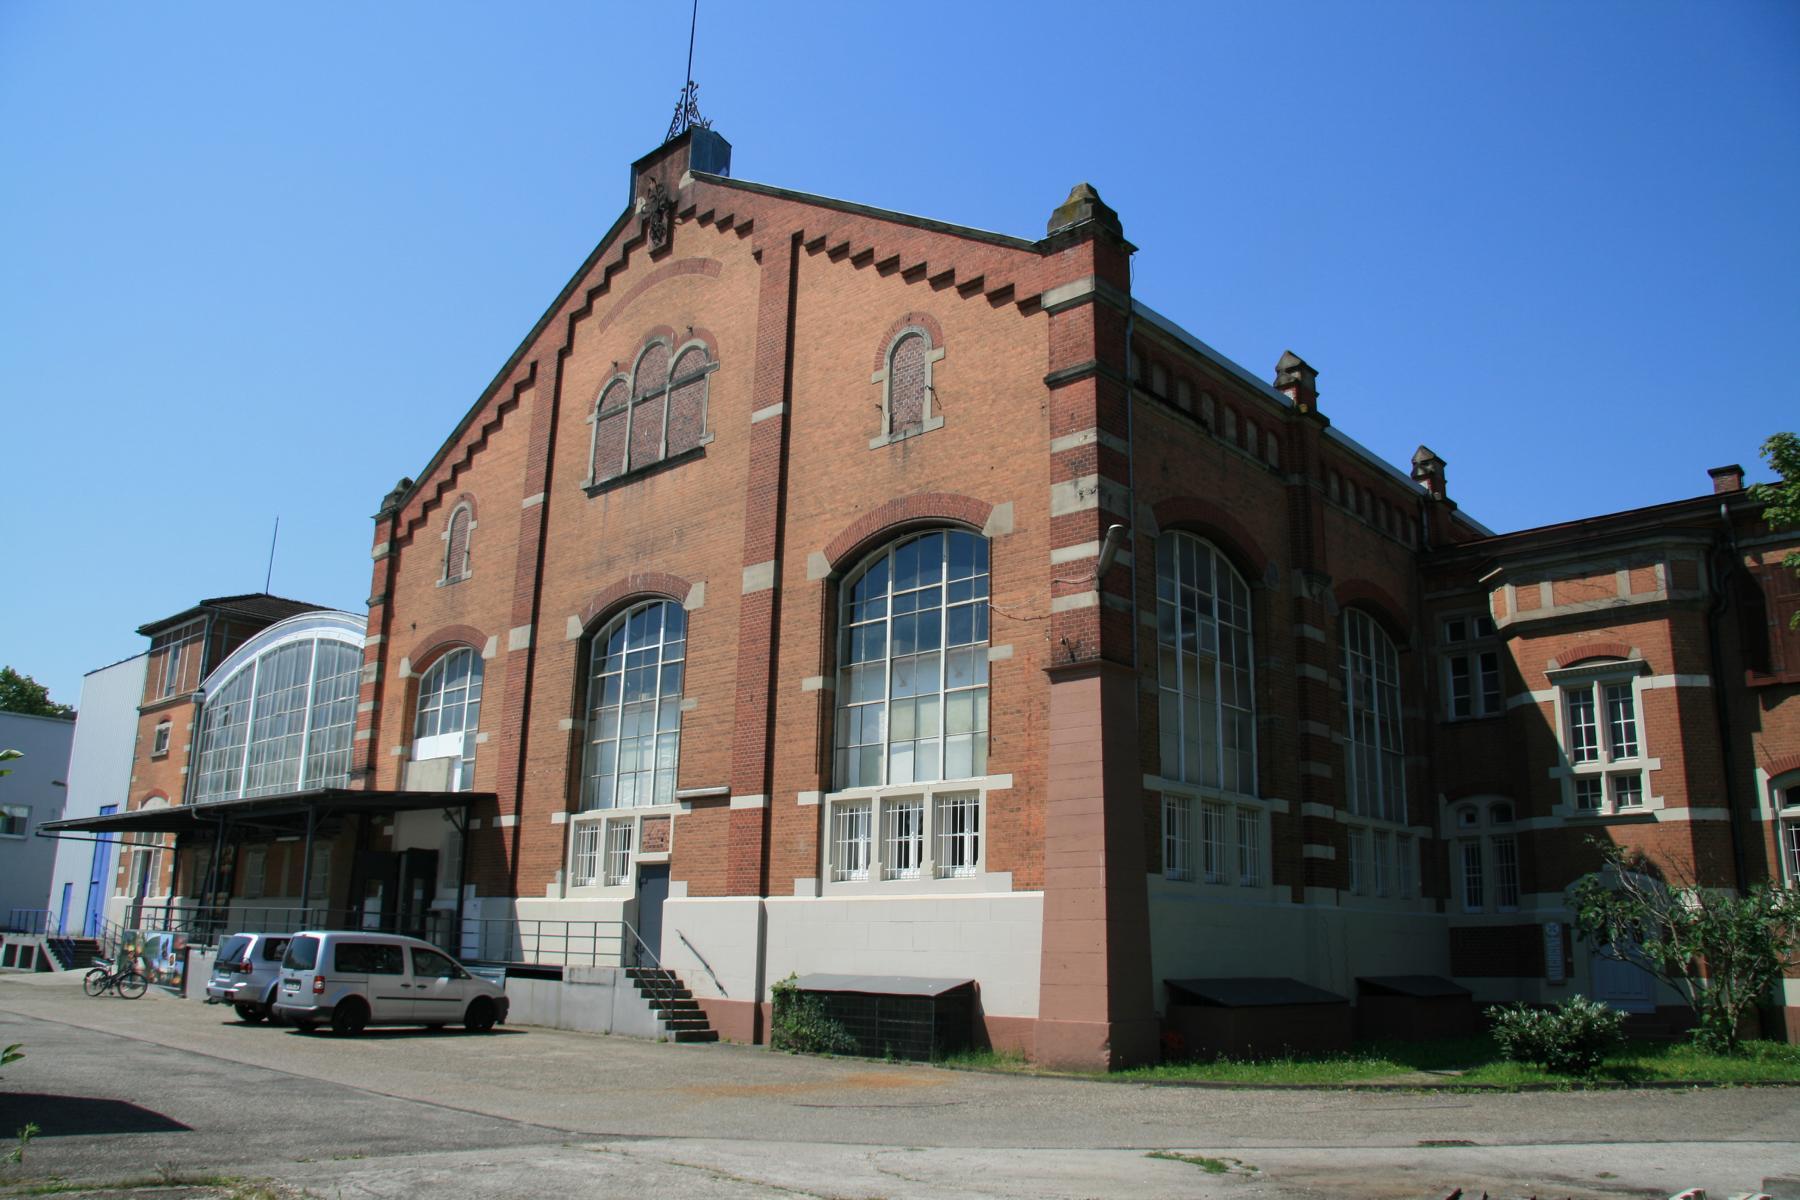 M&R Ladengeschäft Karlsruhe